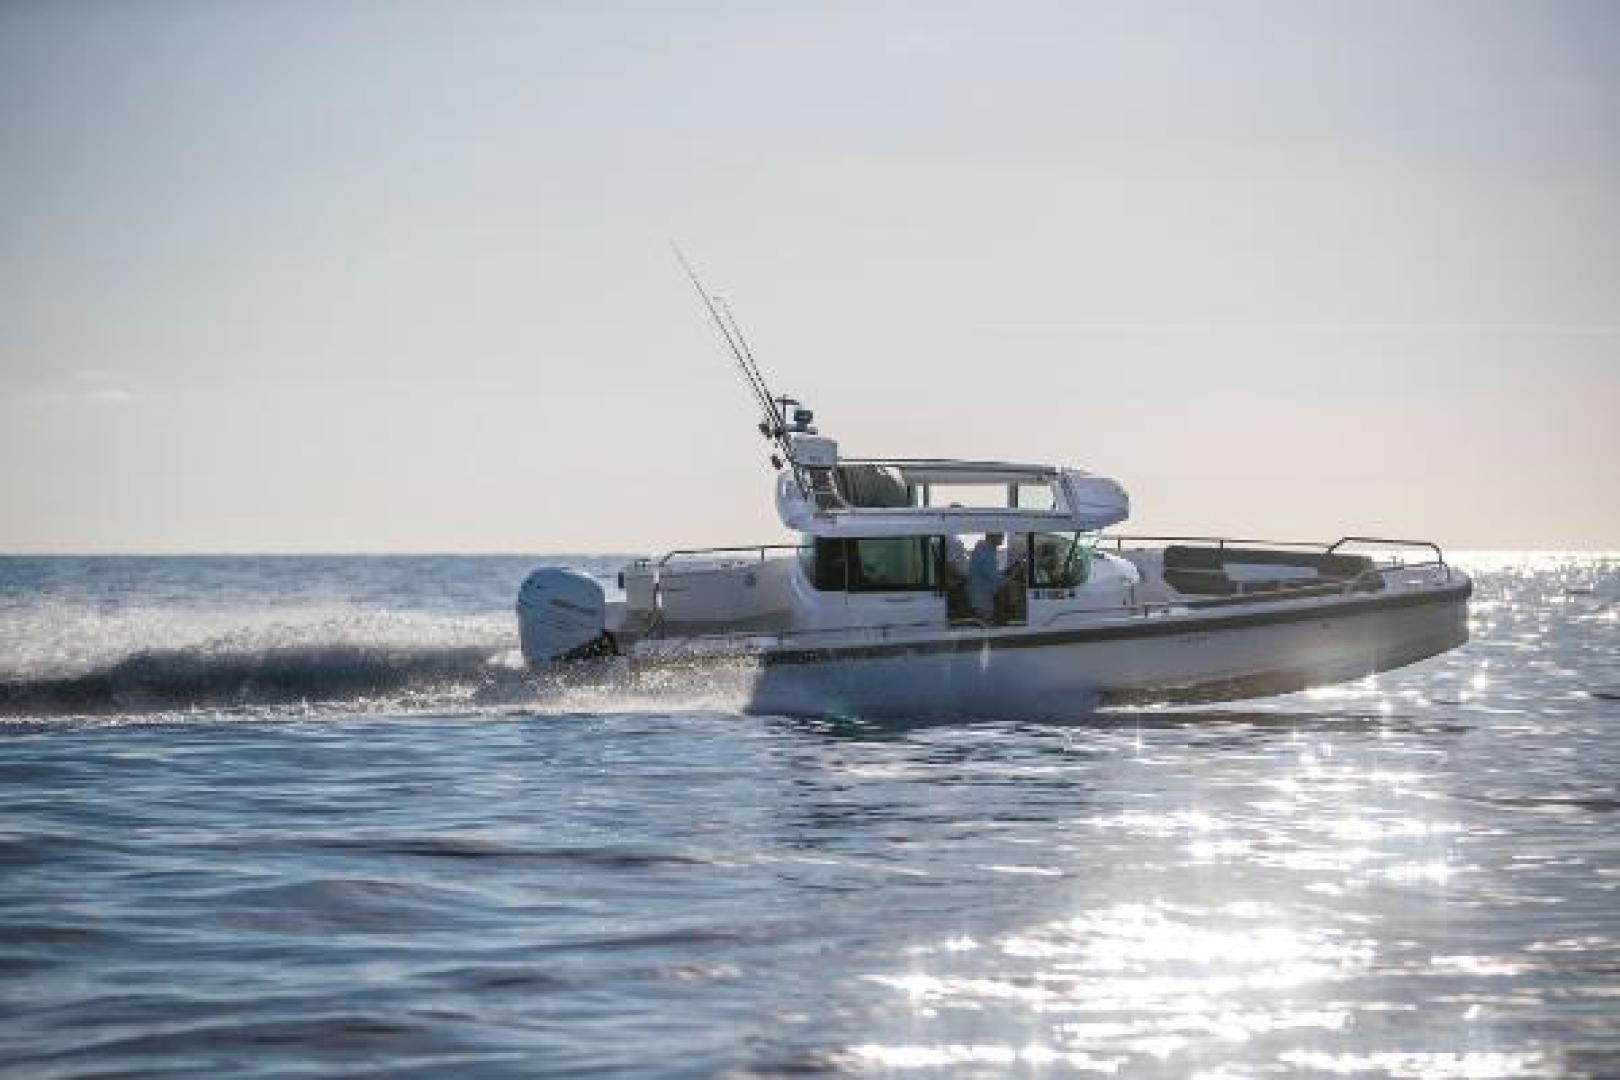 Axopar-28 CABIN 2020-Axopar 28 CABIN Tampa-Florida-United States-1531424 | Thumbnail